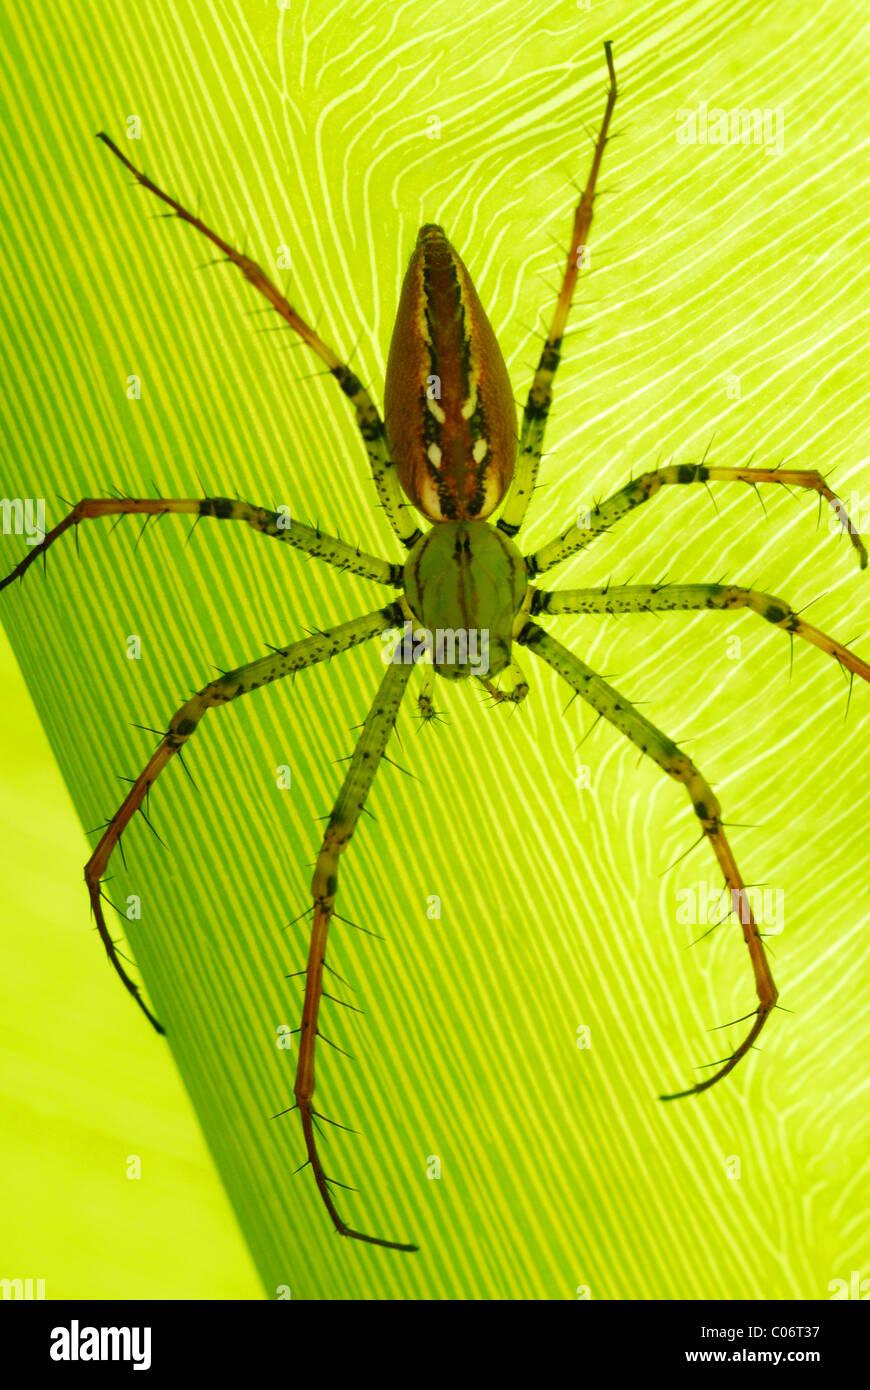 Madagaskar Lynx Spider (Peucetia Madagascariensis) ruht auf einem Blatt in Antsirabe, Zentralmadagaskar. August Stockbild